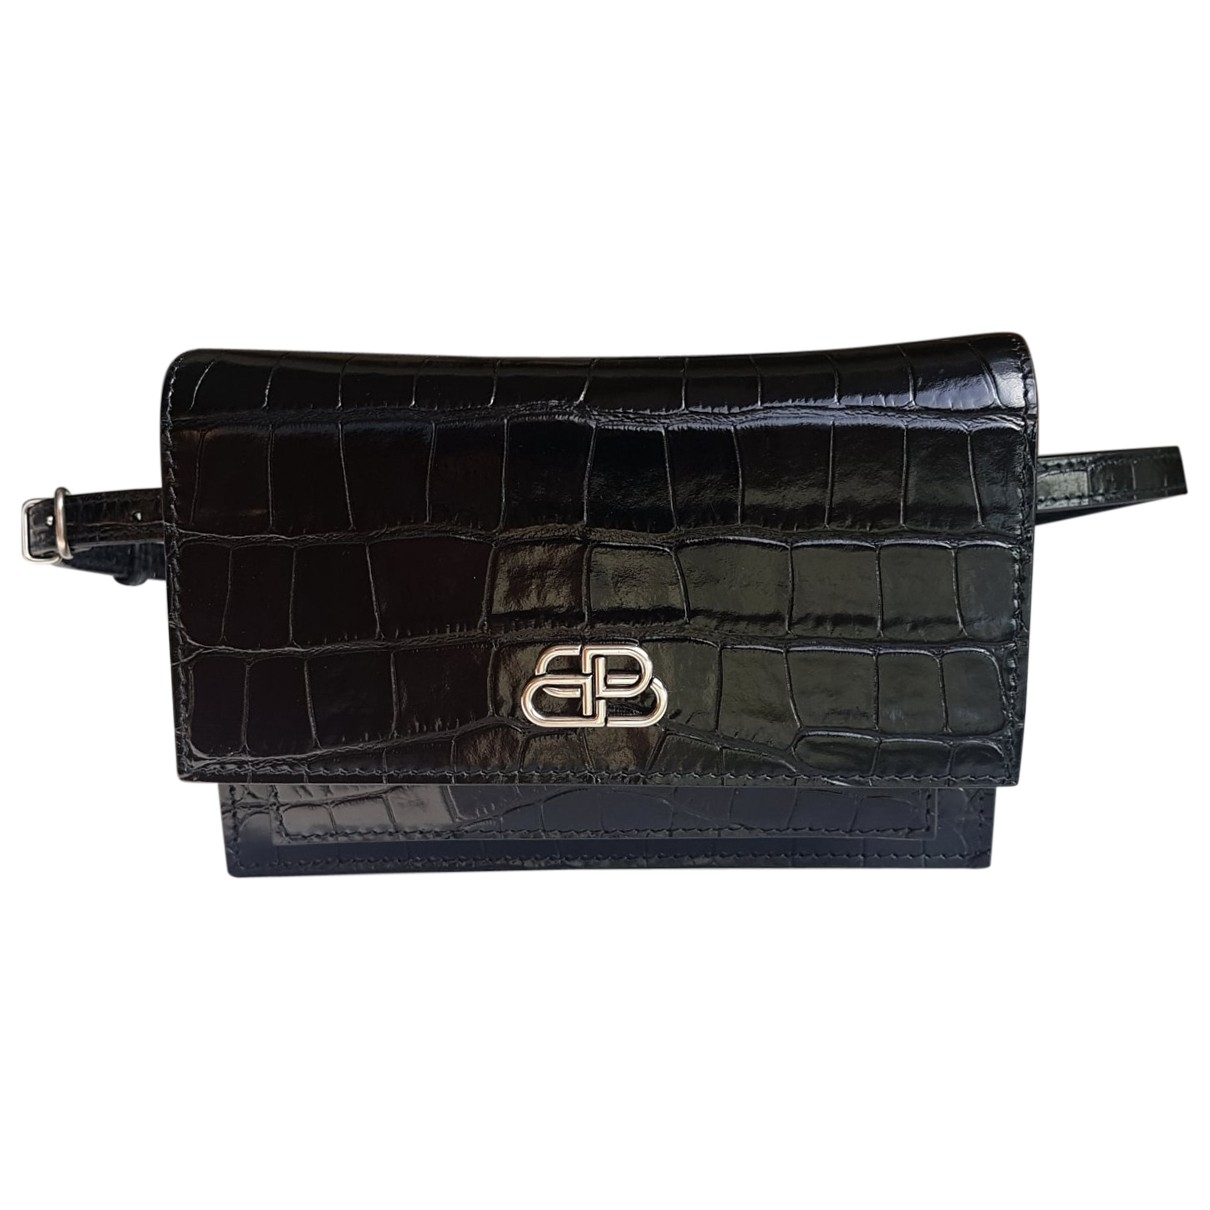 Balenciaga Sharp Black Patent leather handbag for Women \N